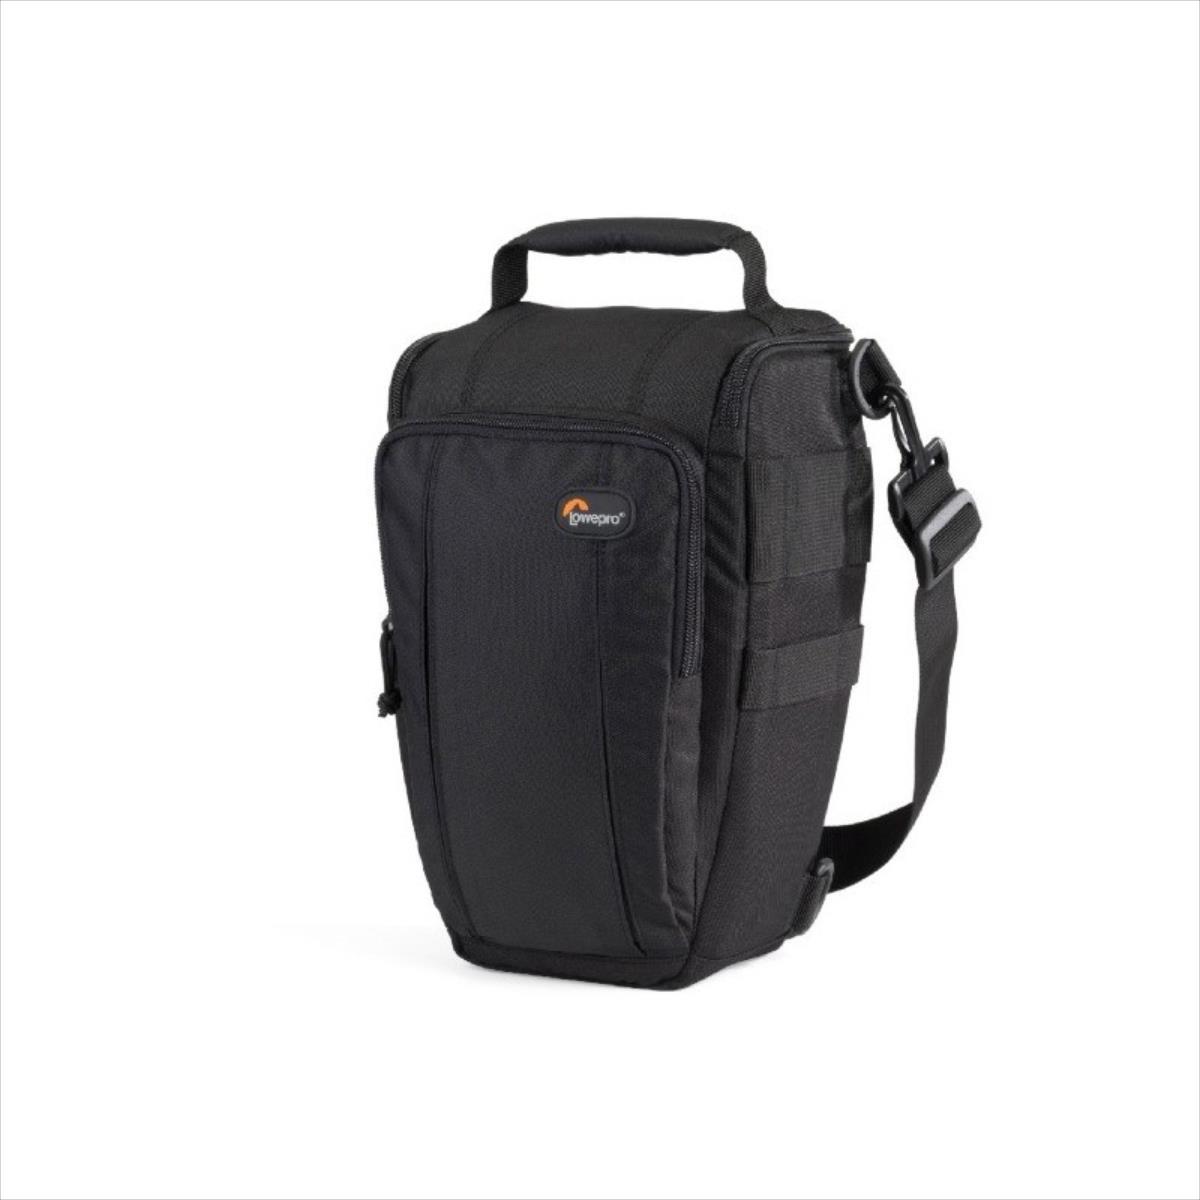 Lowepro Toploader Zoom 55 AW II Black soma foto, video aksesuāriem